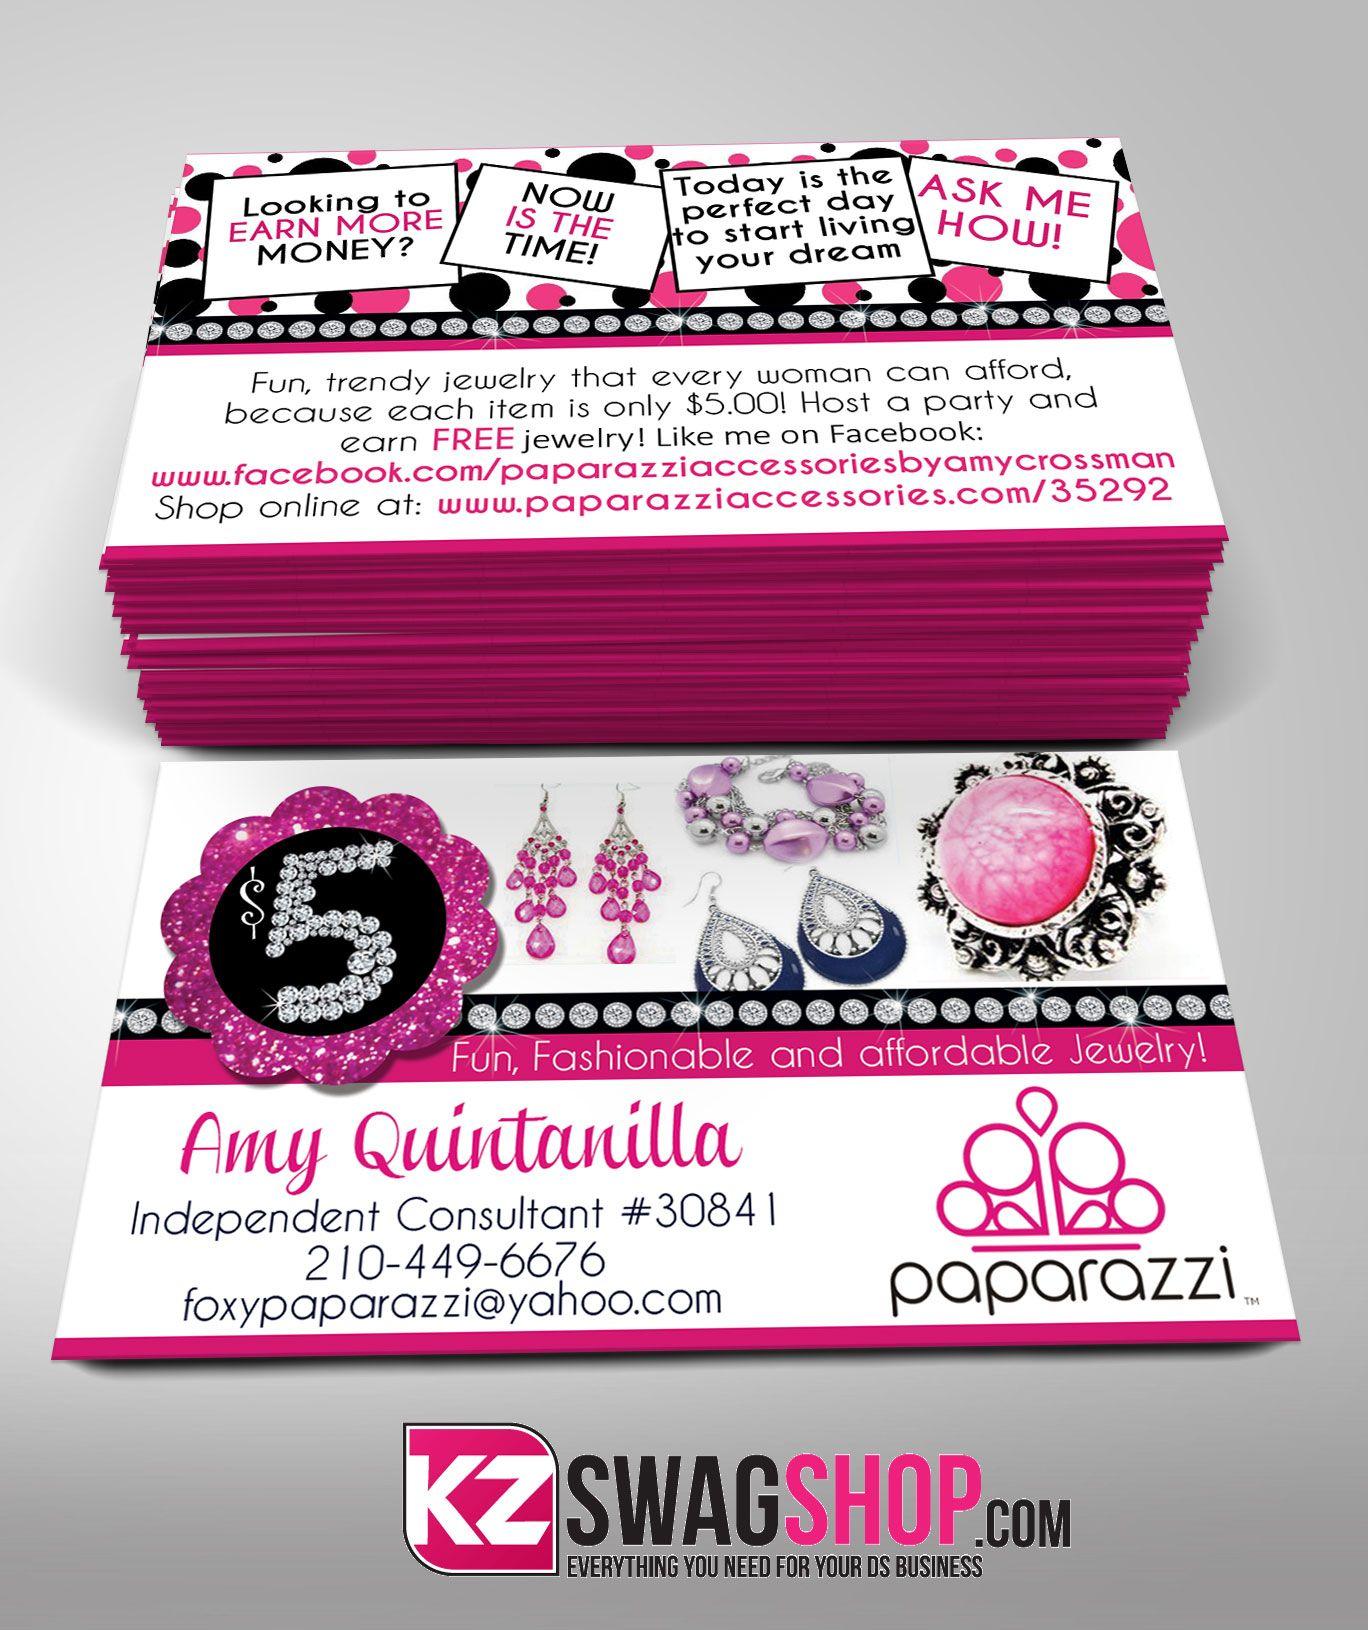 Paparazzi Jewelry Business Cards Style 11   Paparazzi Business Cards ...